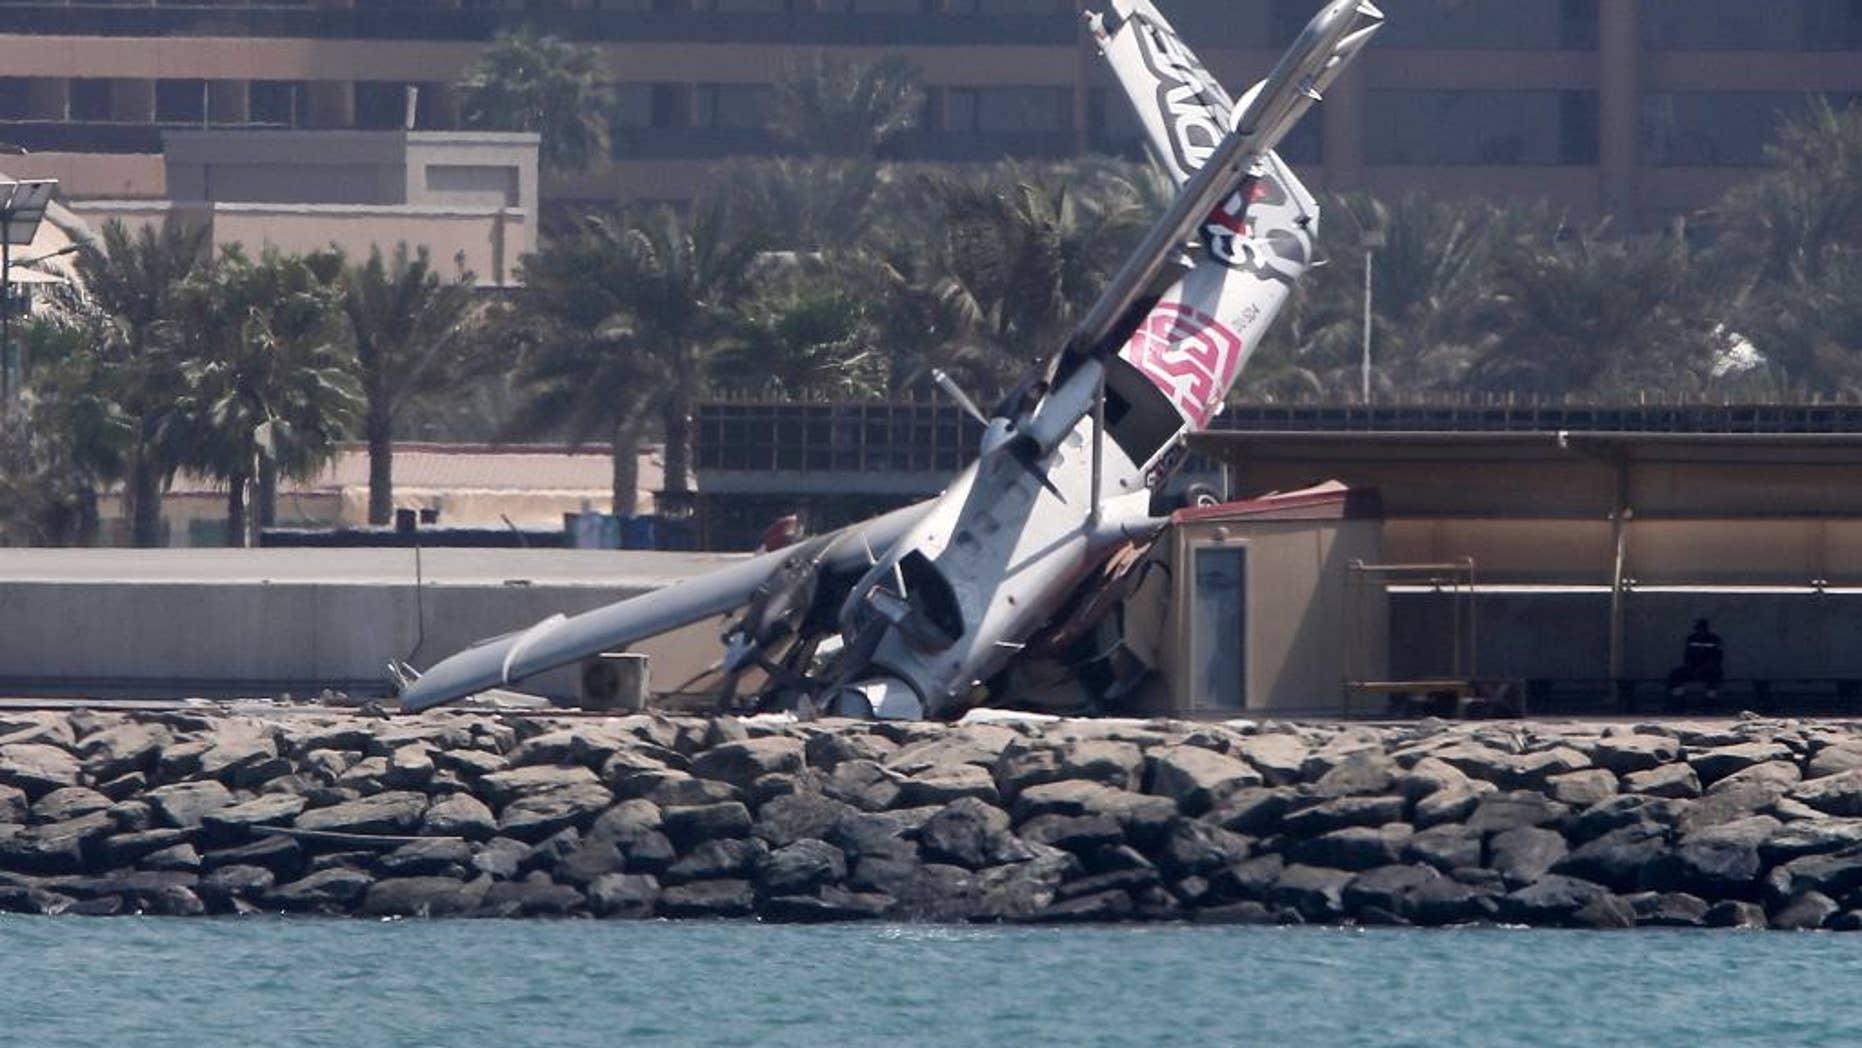 An aircraft belonging to a Dubai skydiving company is seen after crashing off the runway Friday, Oct. 2, 2015, in Dubai, United Arab Emirates. (AP Photo/Kamran Jebreili)